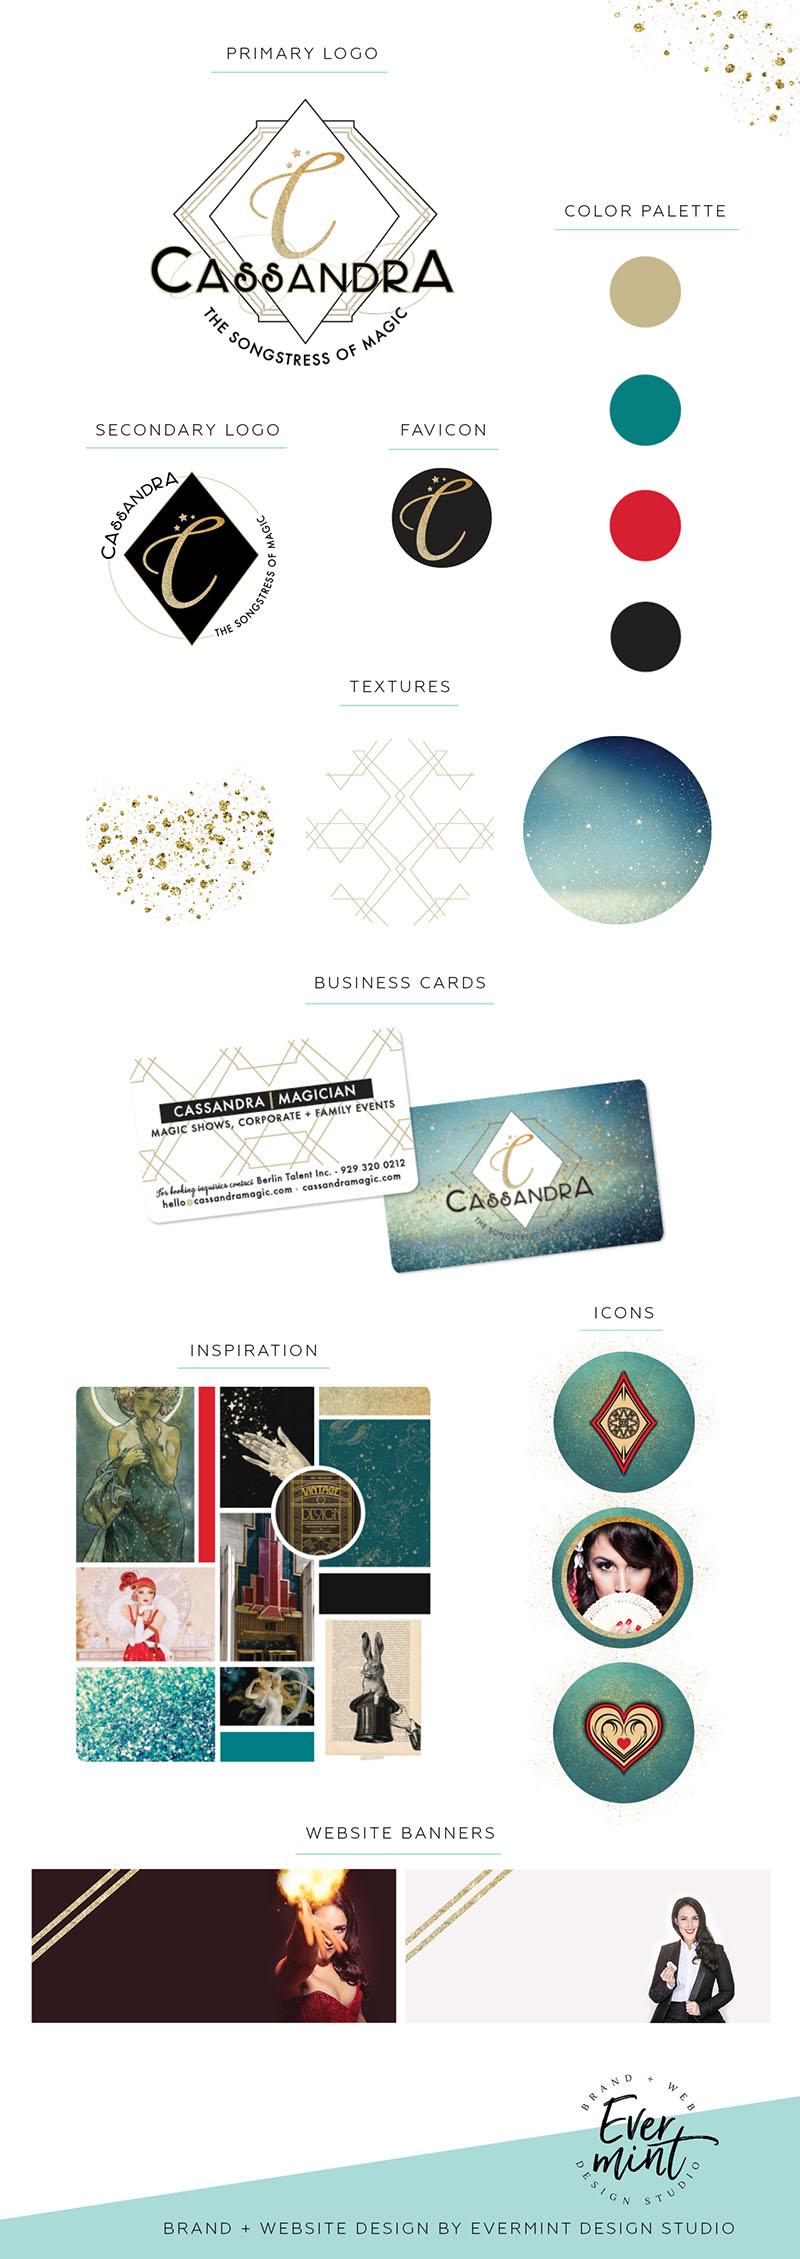 Brand Board for Cassandra, the Songstress of Magic